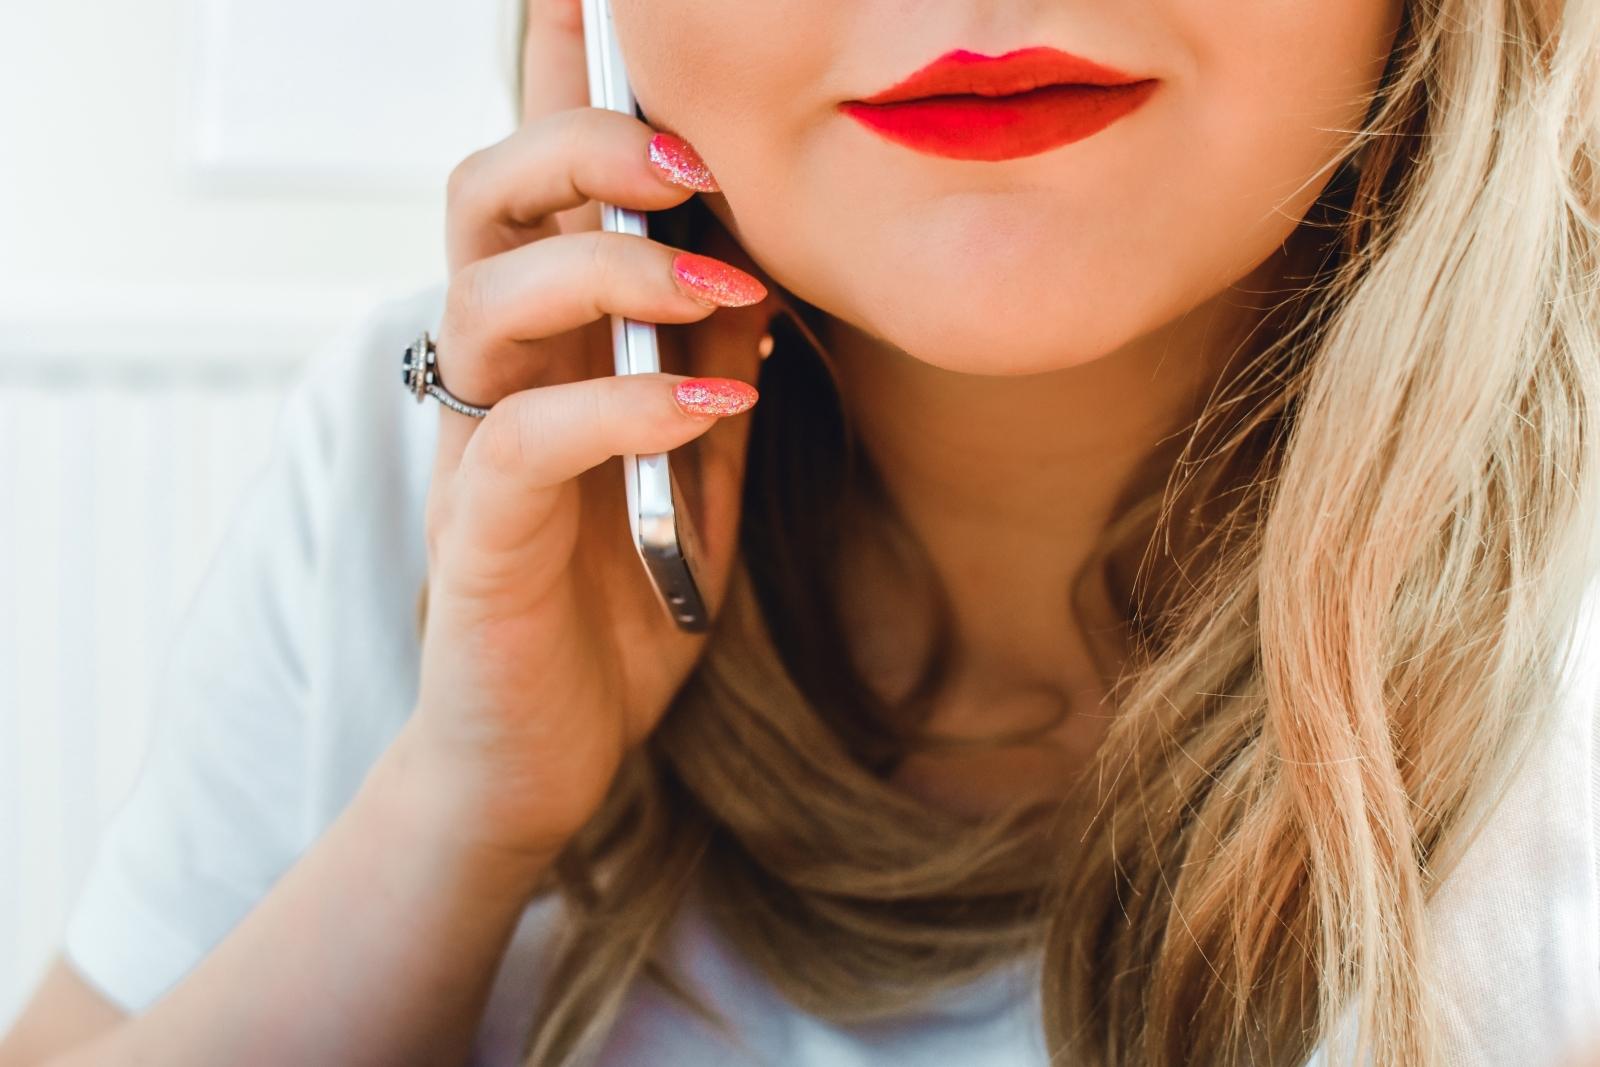 Naples PI Private Investigator Detective phone spying